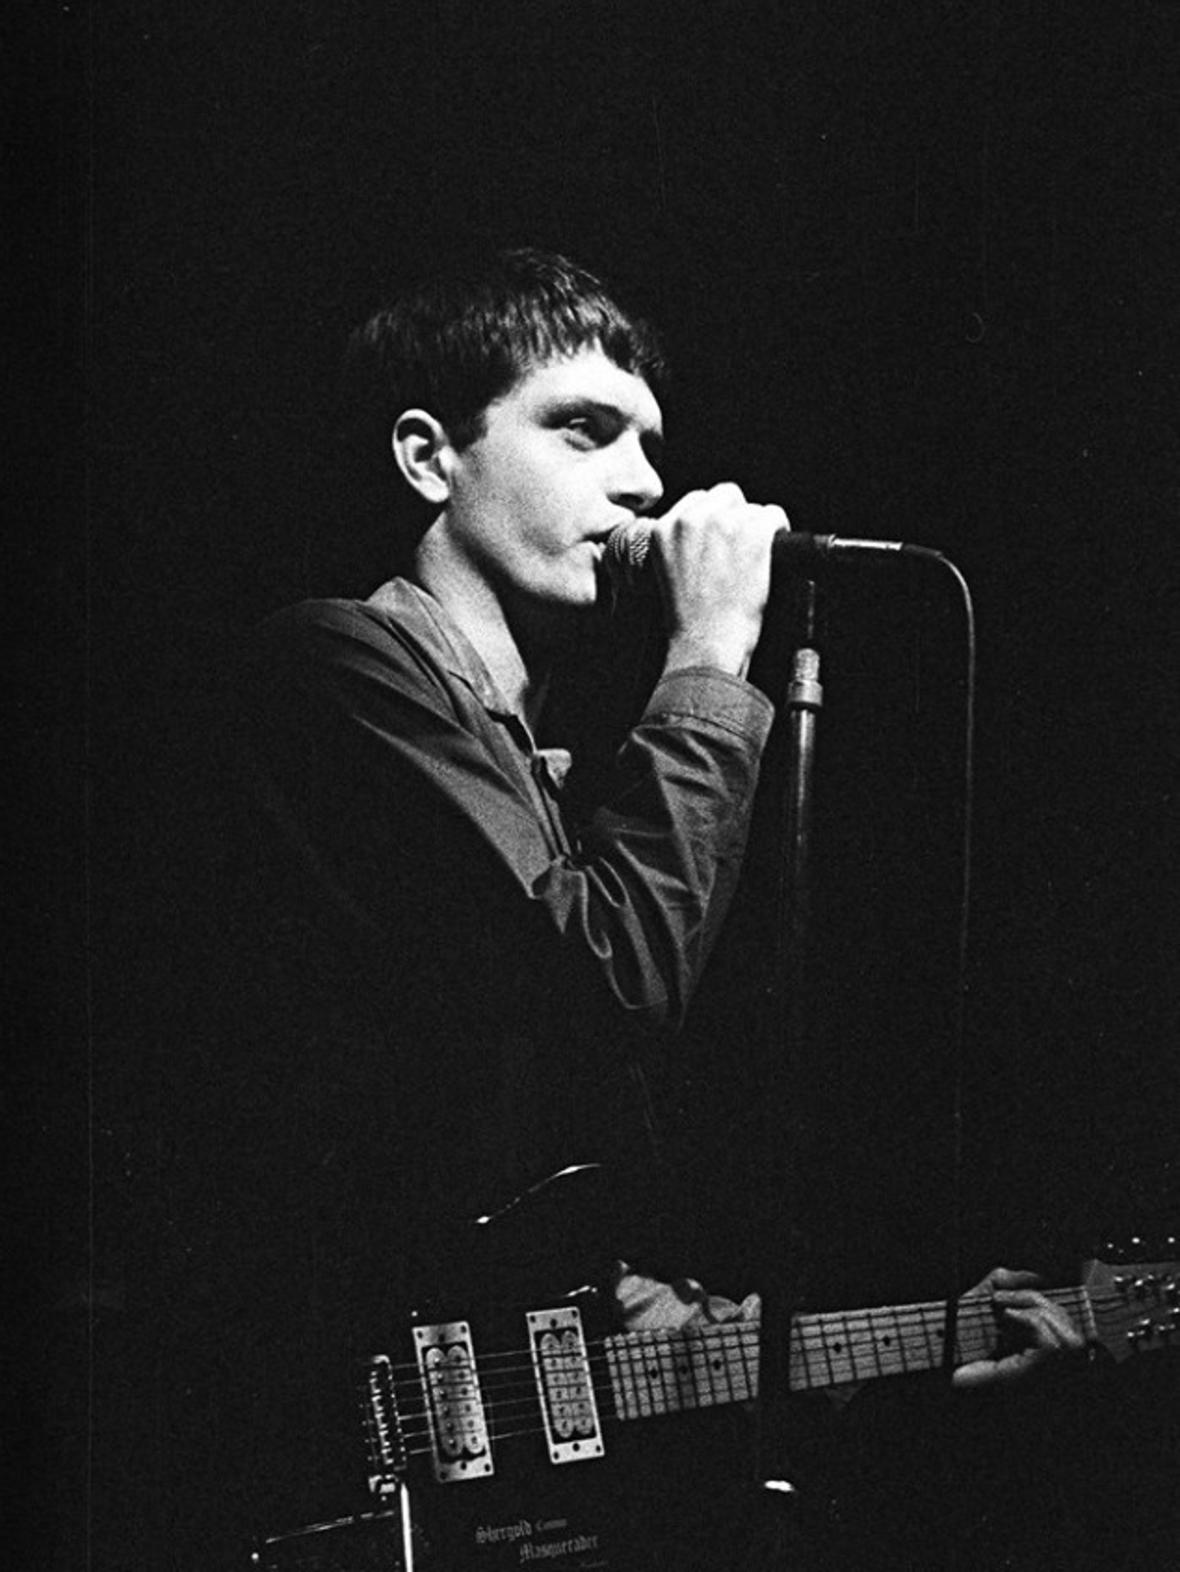 37 lat temu zmarł Ian Curtis z Joy Division